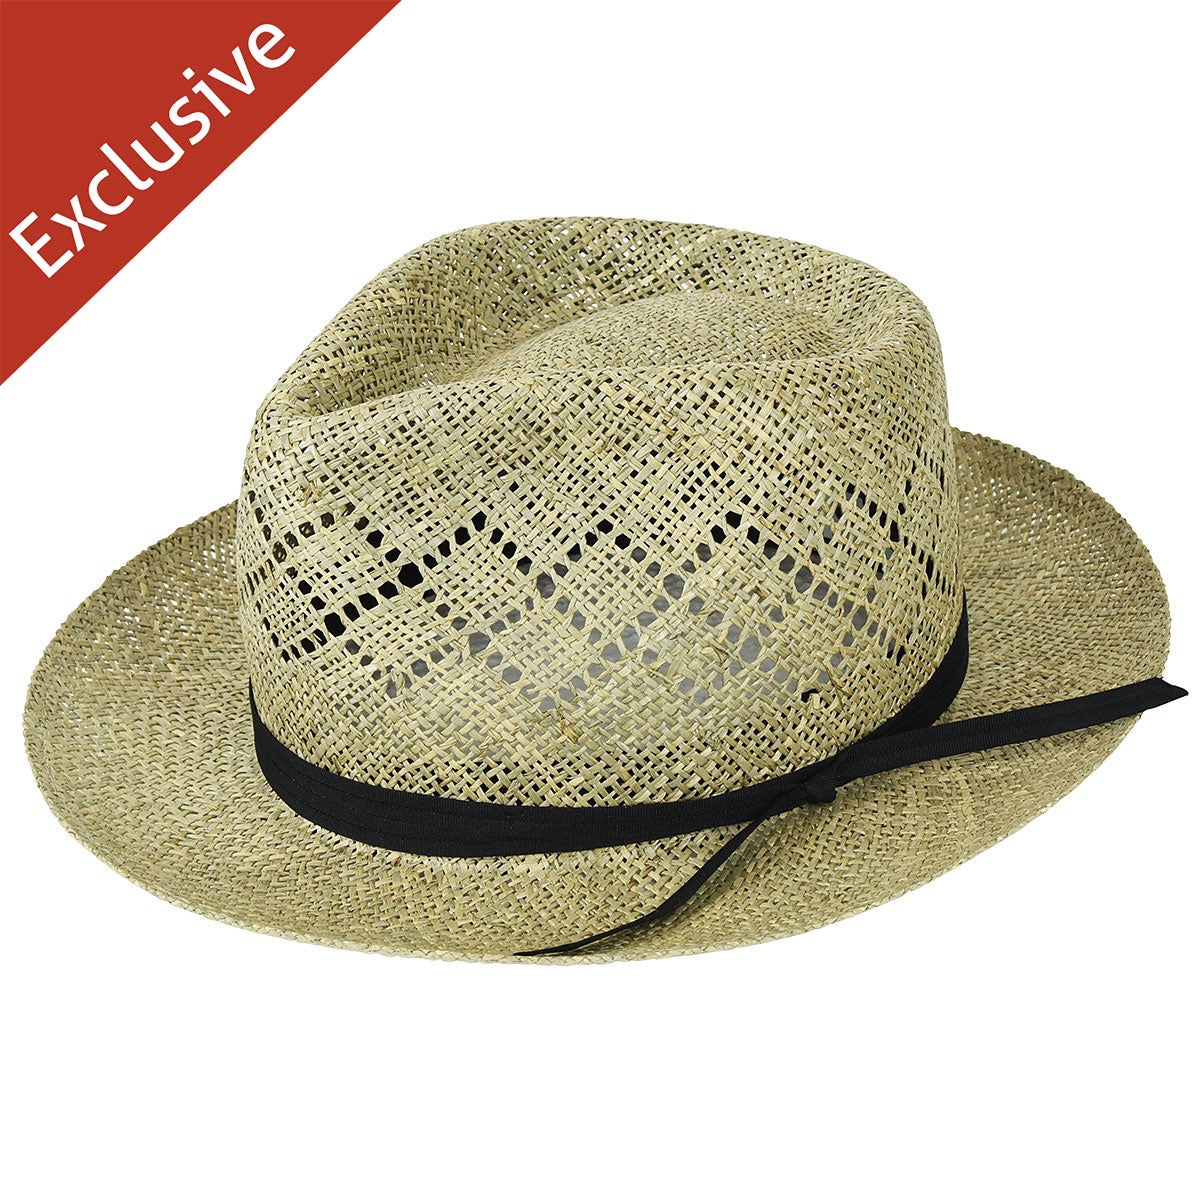 Hats.com Castine Fedora - Exclusive in Dark Natural